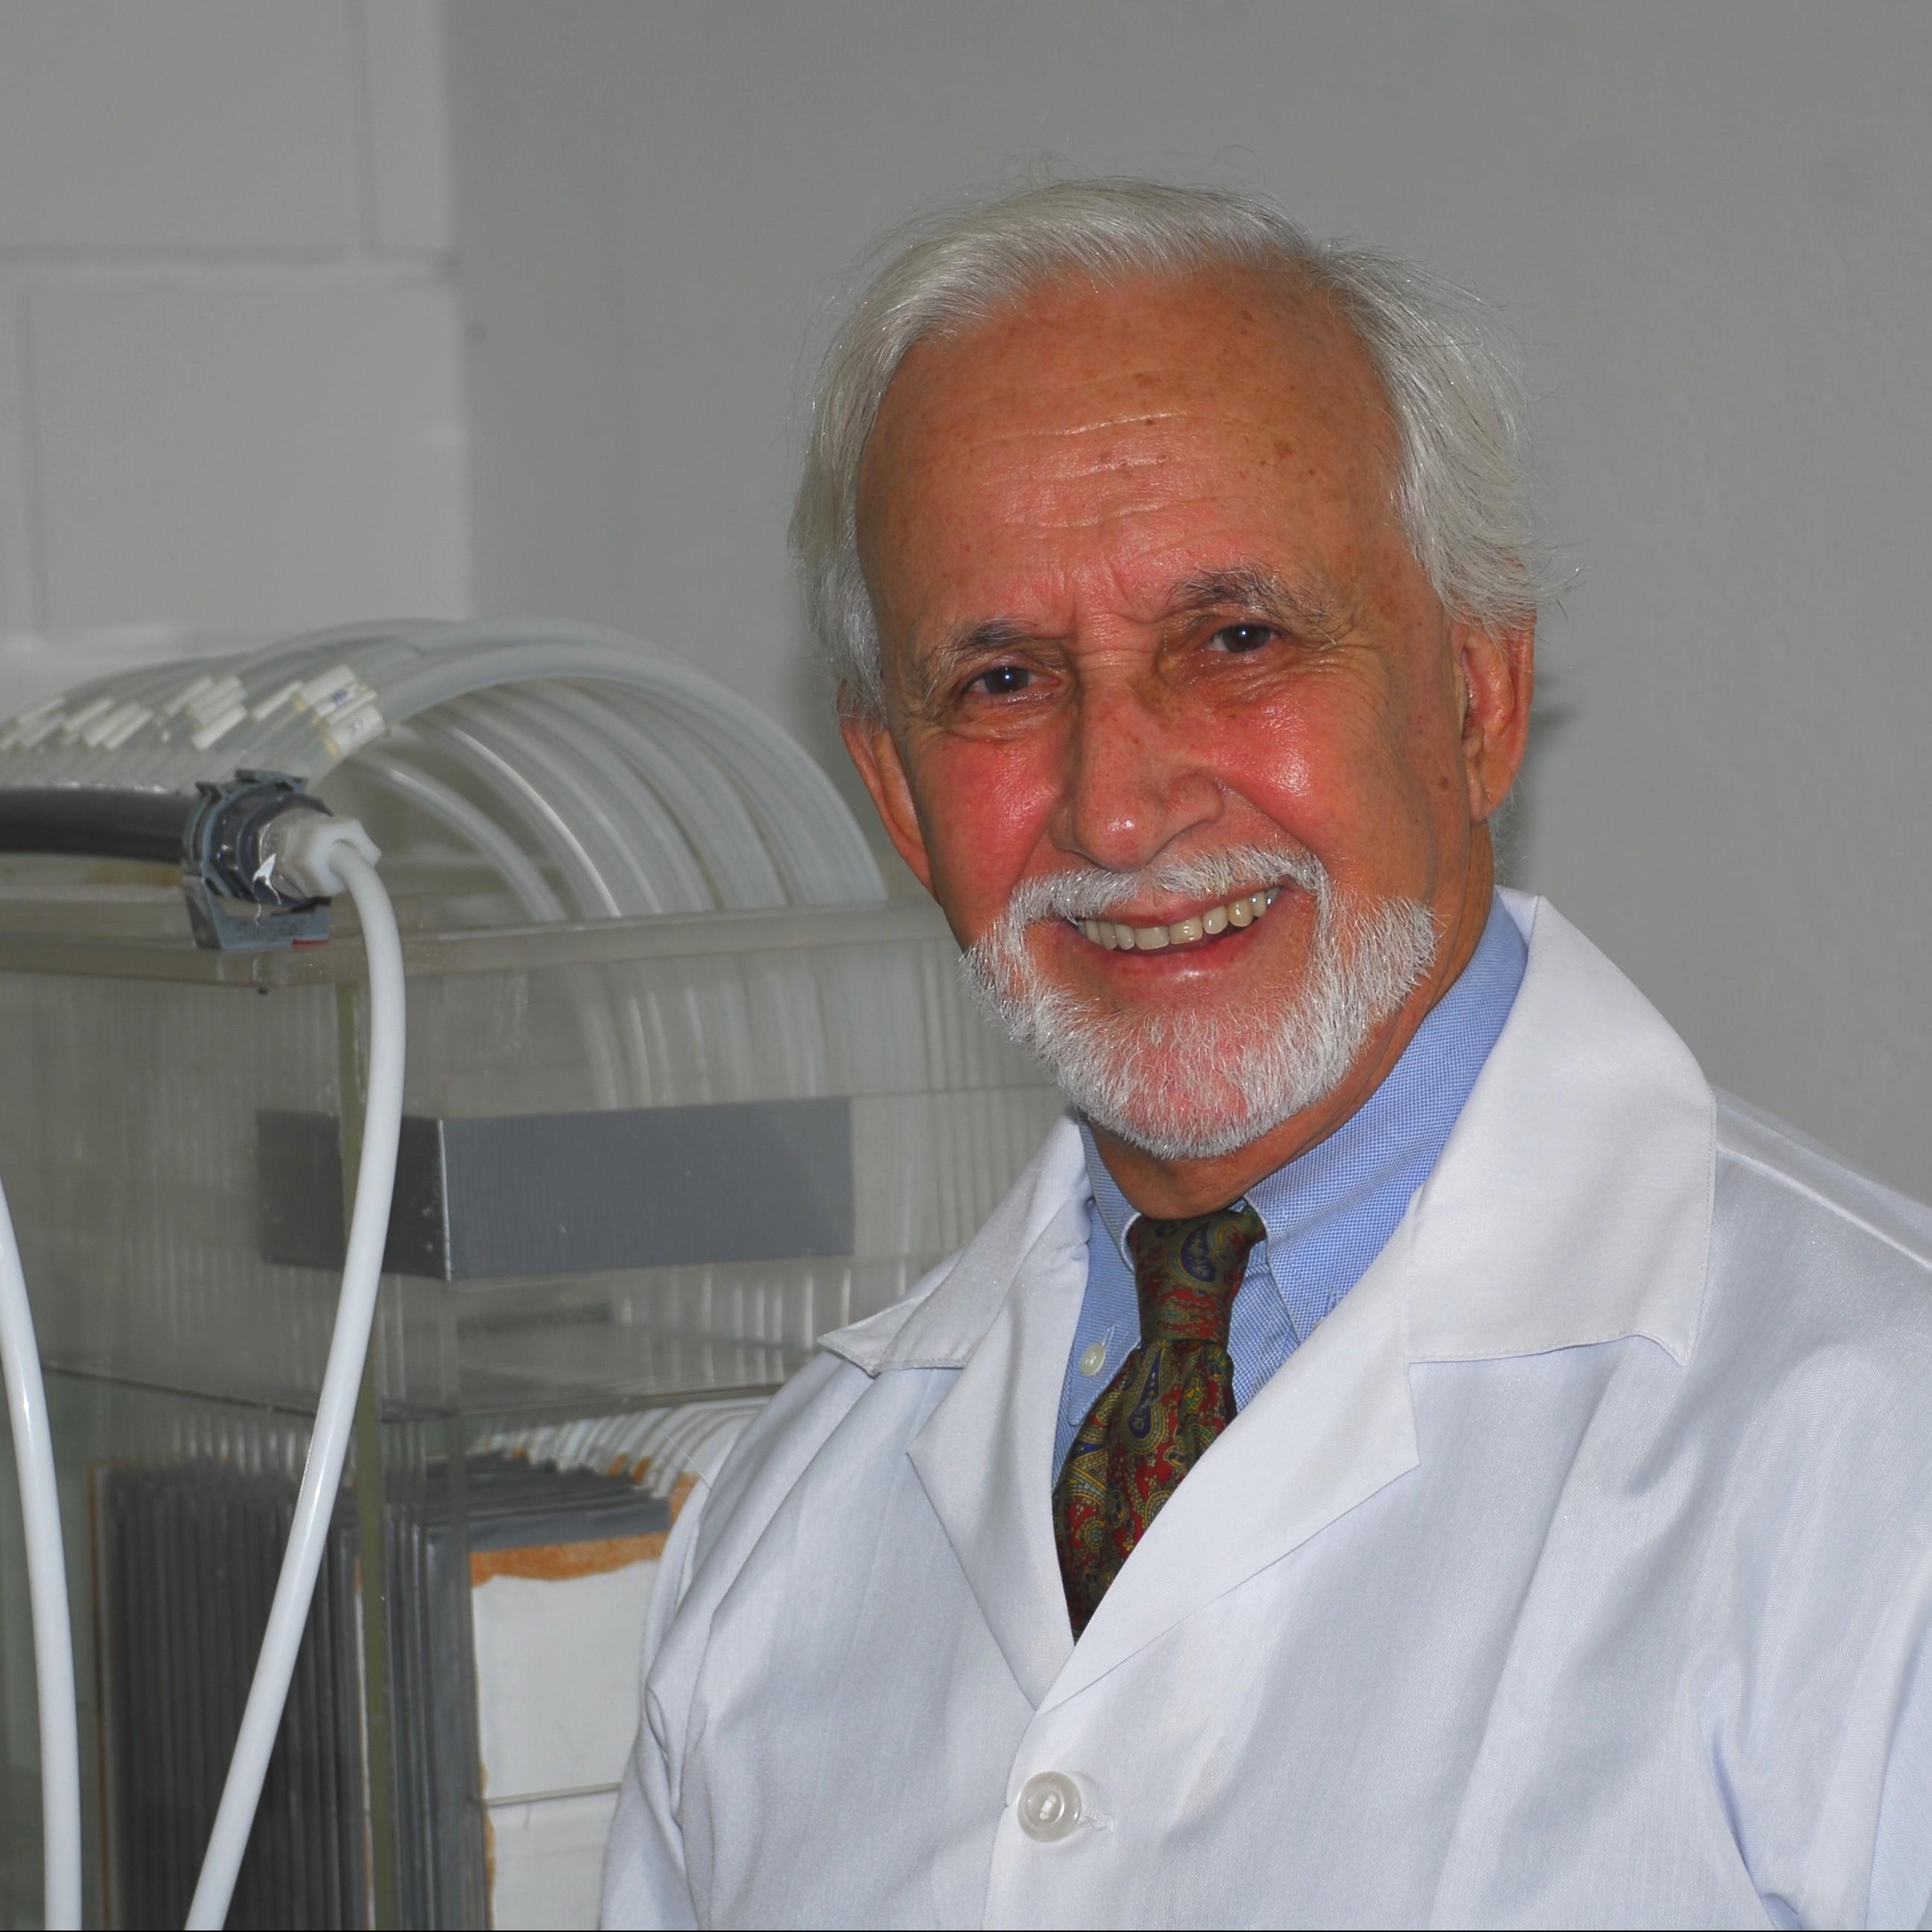 Prof. Ivanildo Hespanhol, PhD